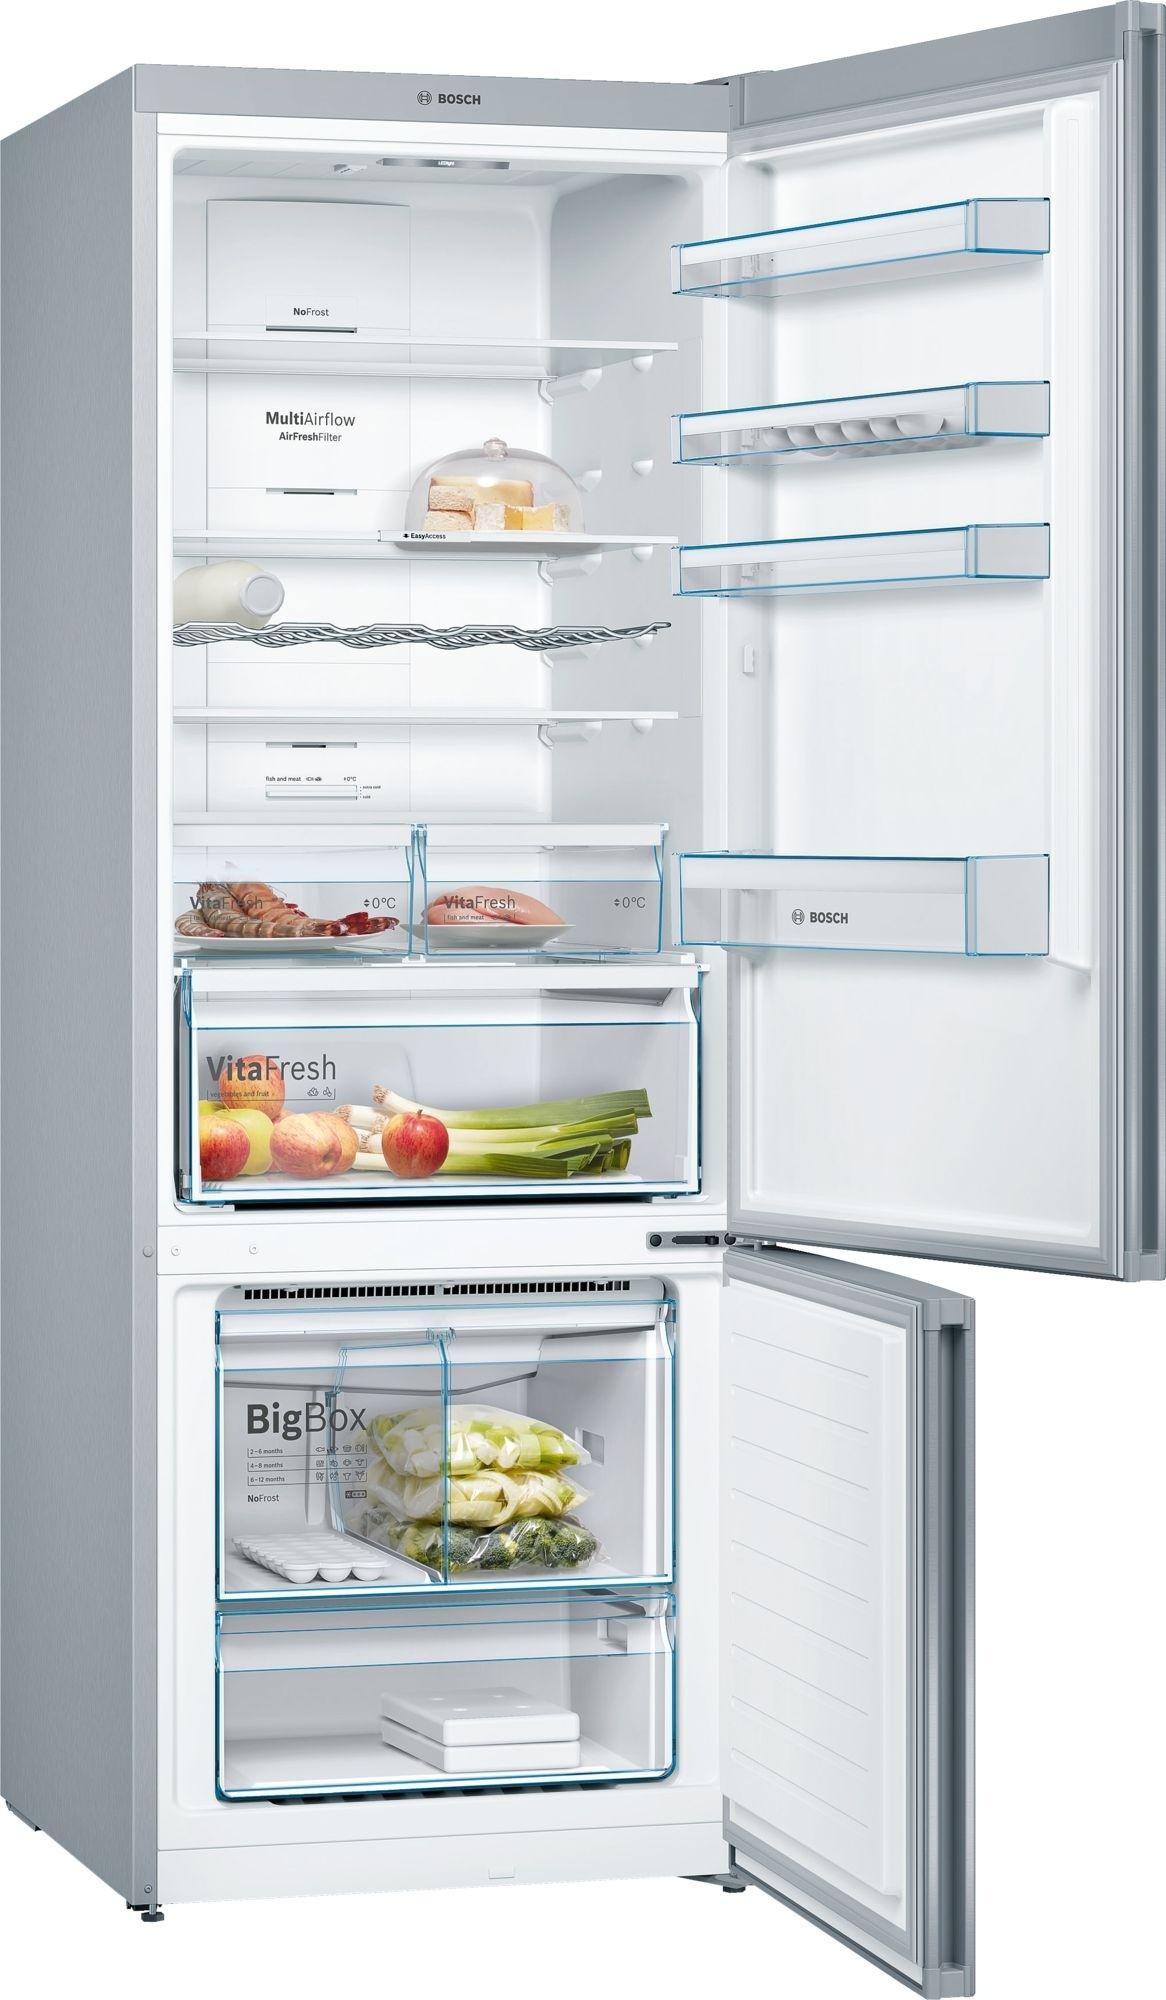 Bosch KGN5XLEA Fridge Freezer